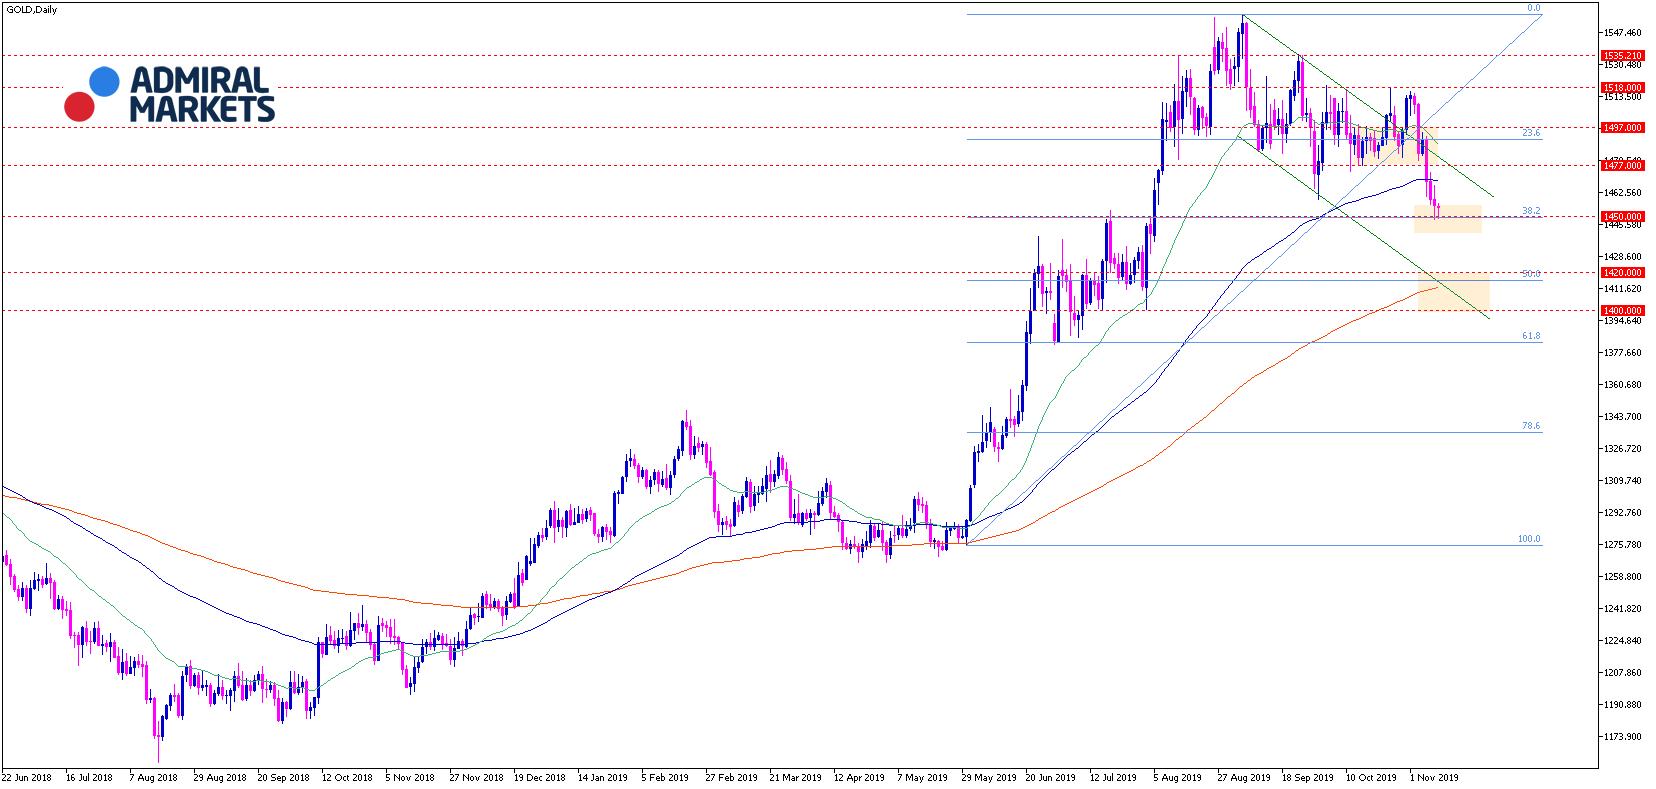 Gold-Analyse-Ausverkauf-nach-False-Breakout-Kommentar-Admiral-Markets-GodmodeTrader.de-1